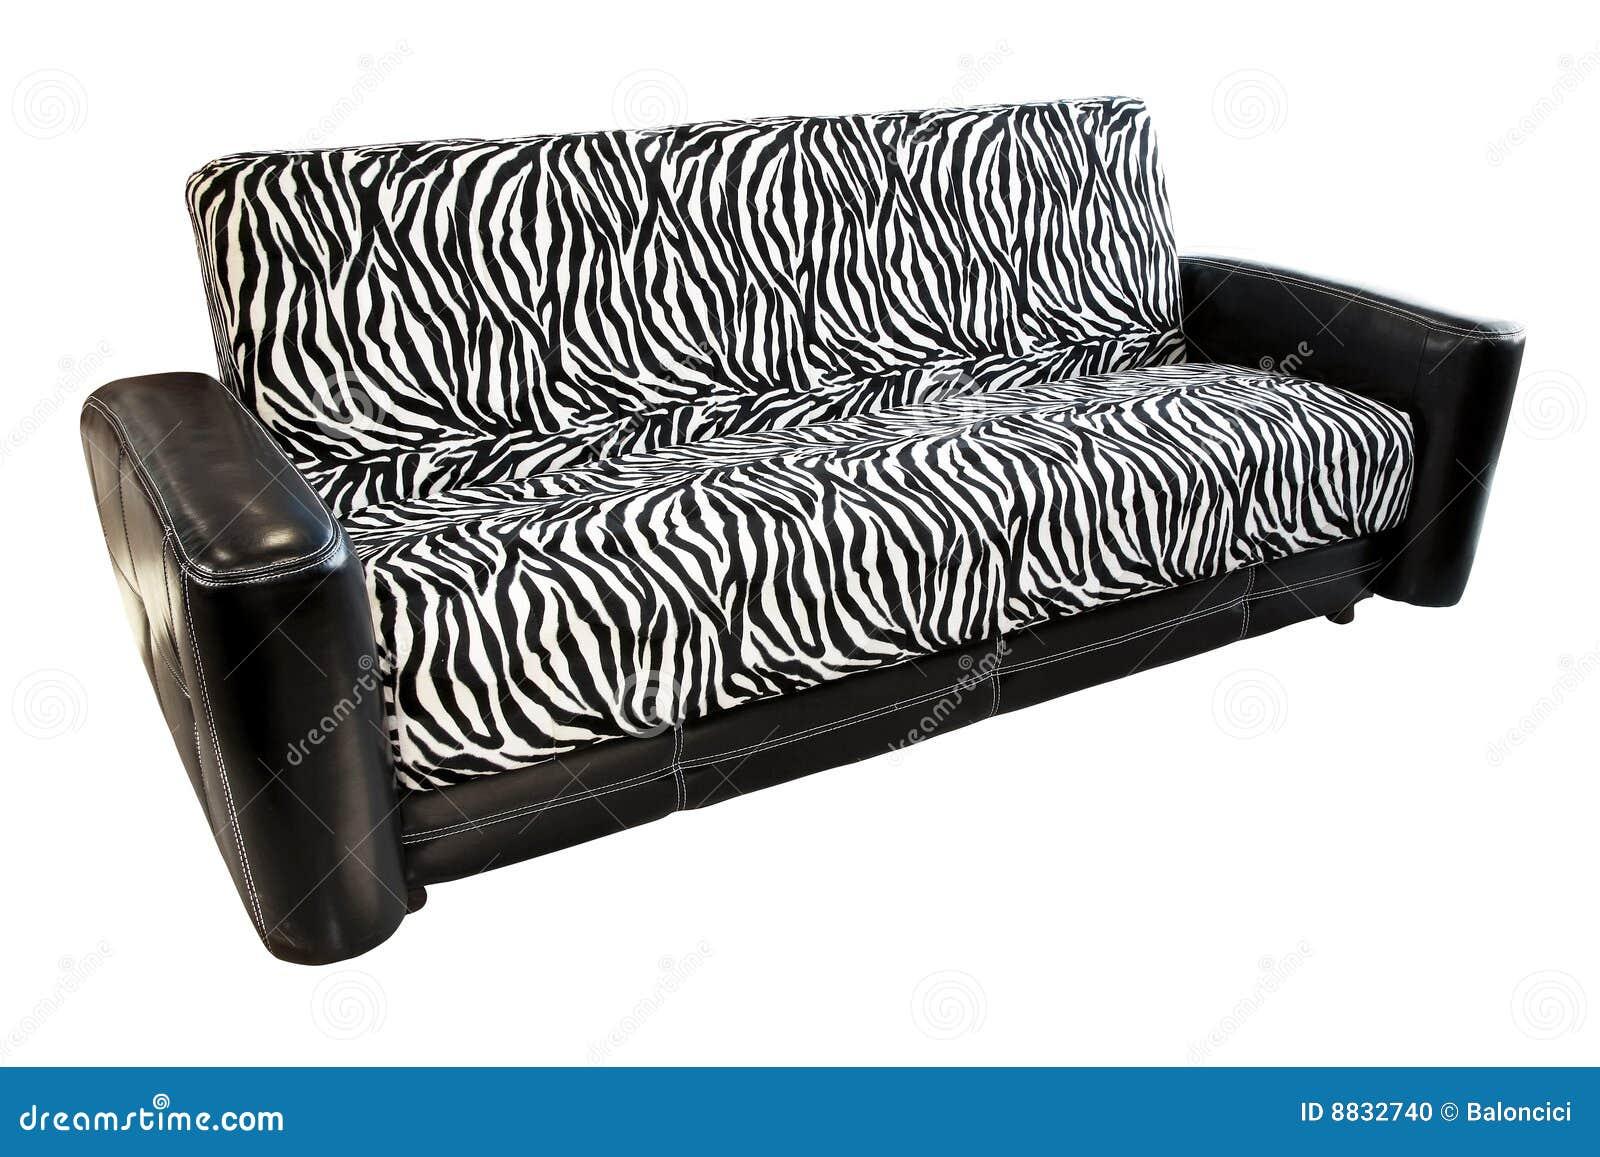 Zebra Sofa Stock Photo Image 8832740